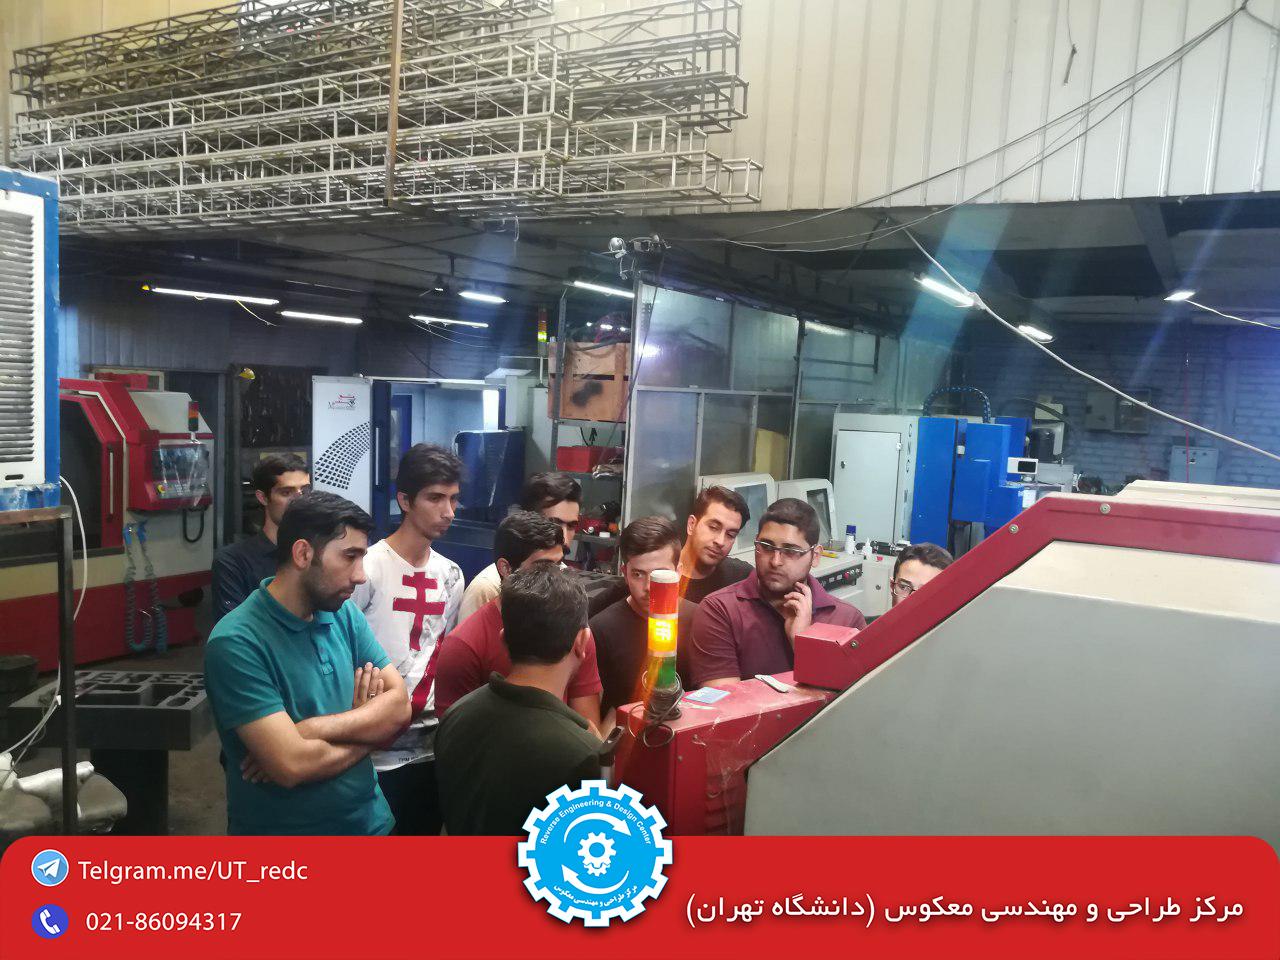 اپراتوری CNC